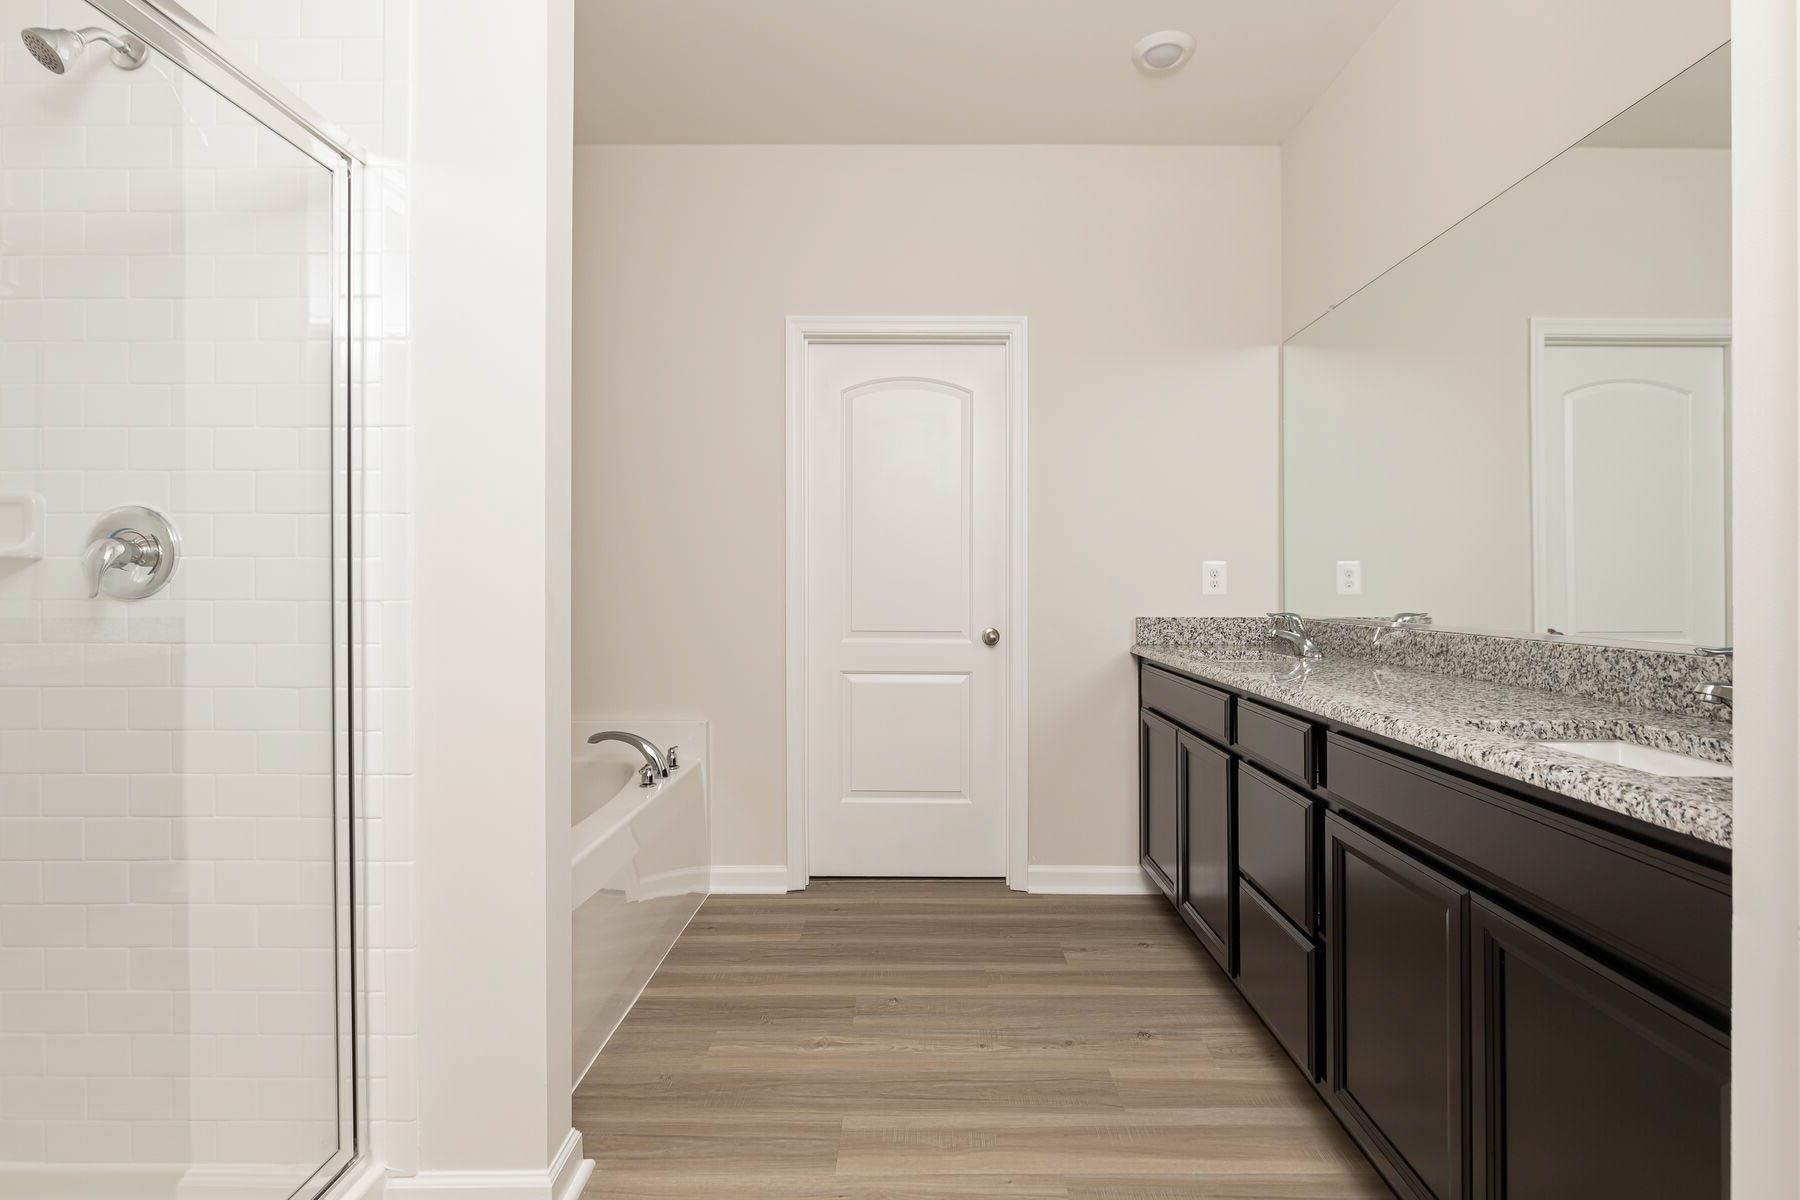 Bathroom featured in the Roanoke By LGI Homes in Richmond-Petersburg, VA